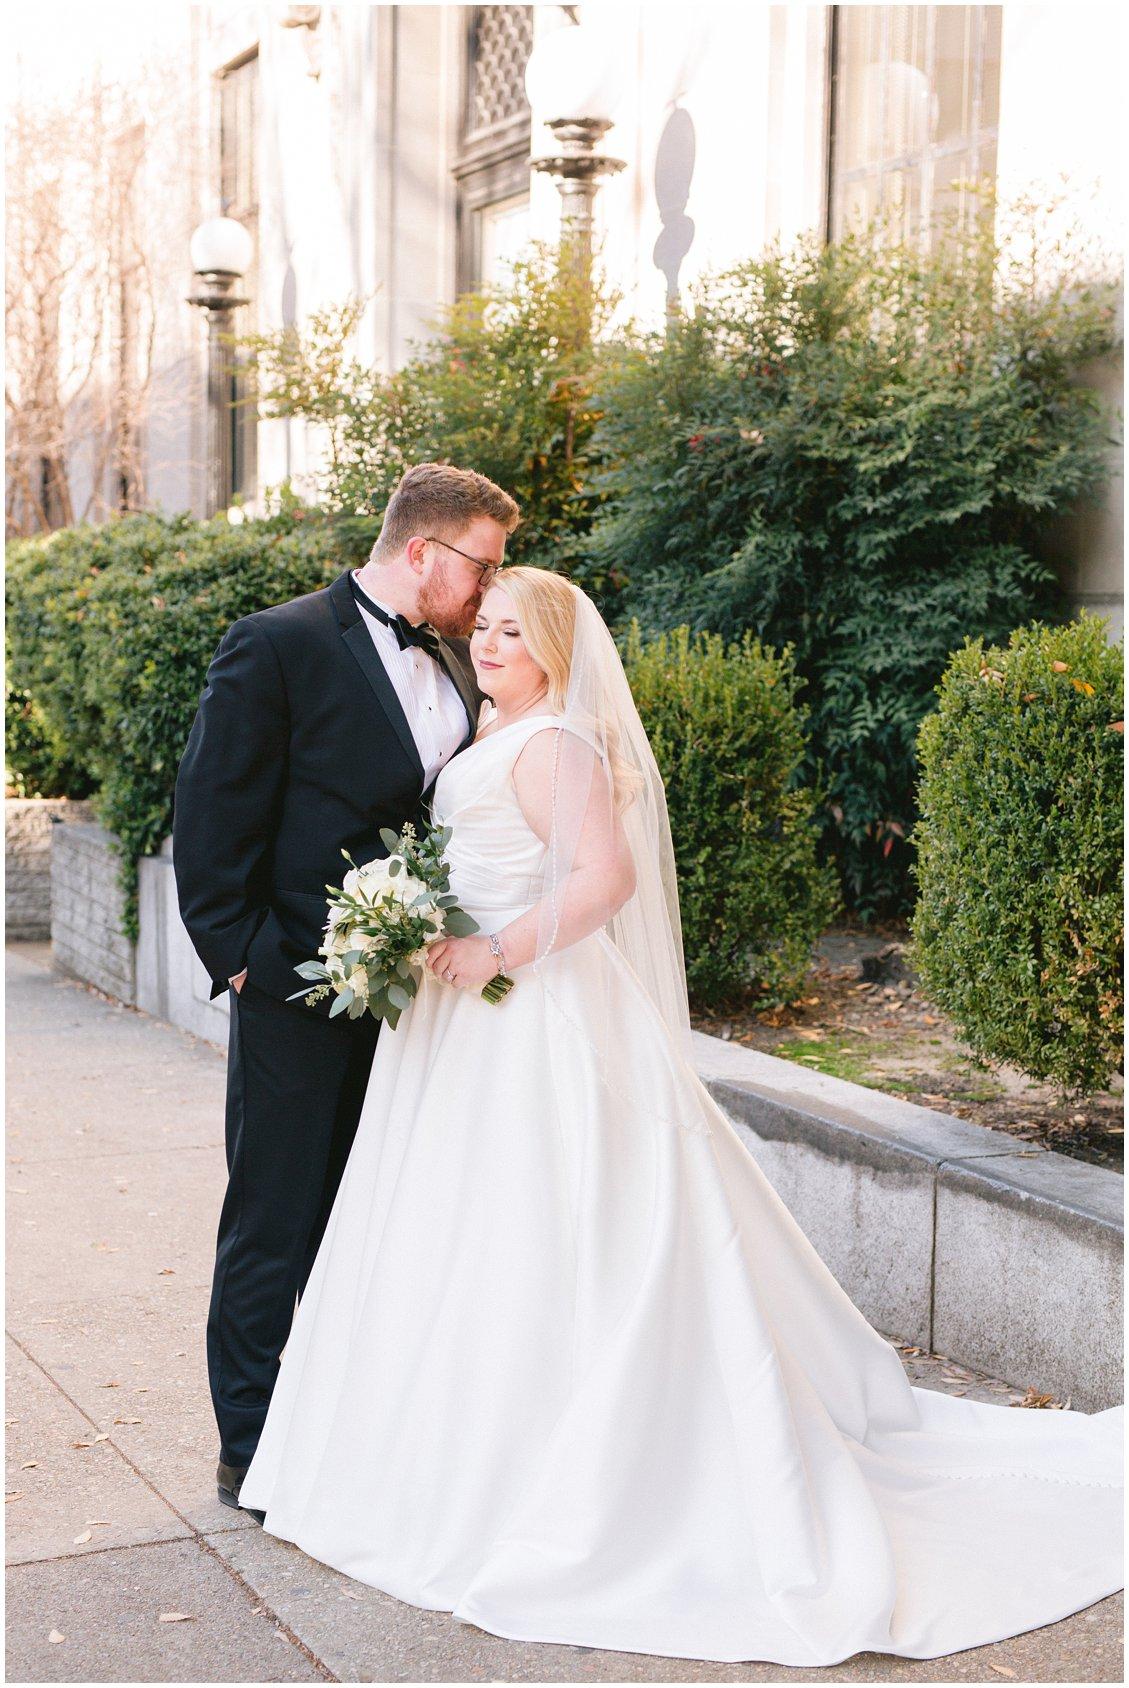 An elegant Richmond Virginia winter wedding by Tara & Stephen - a husband and wife adventure photography team